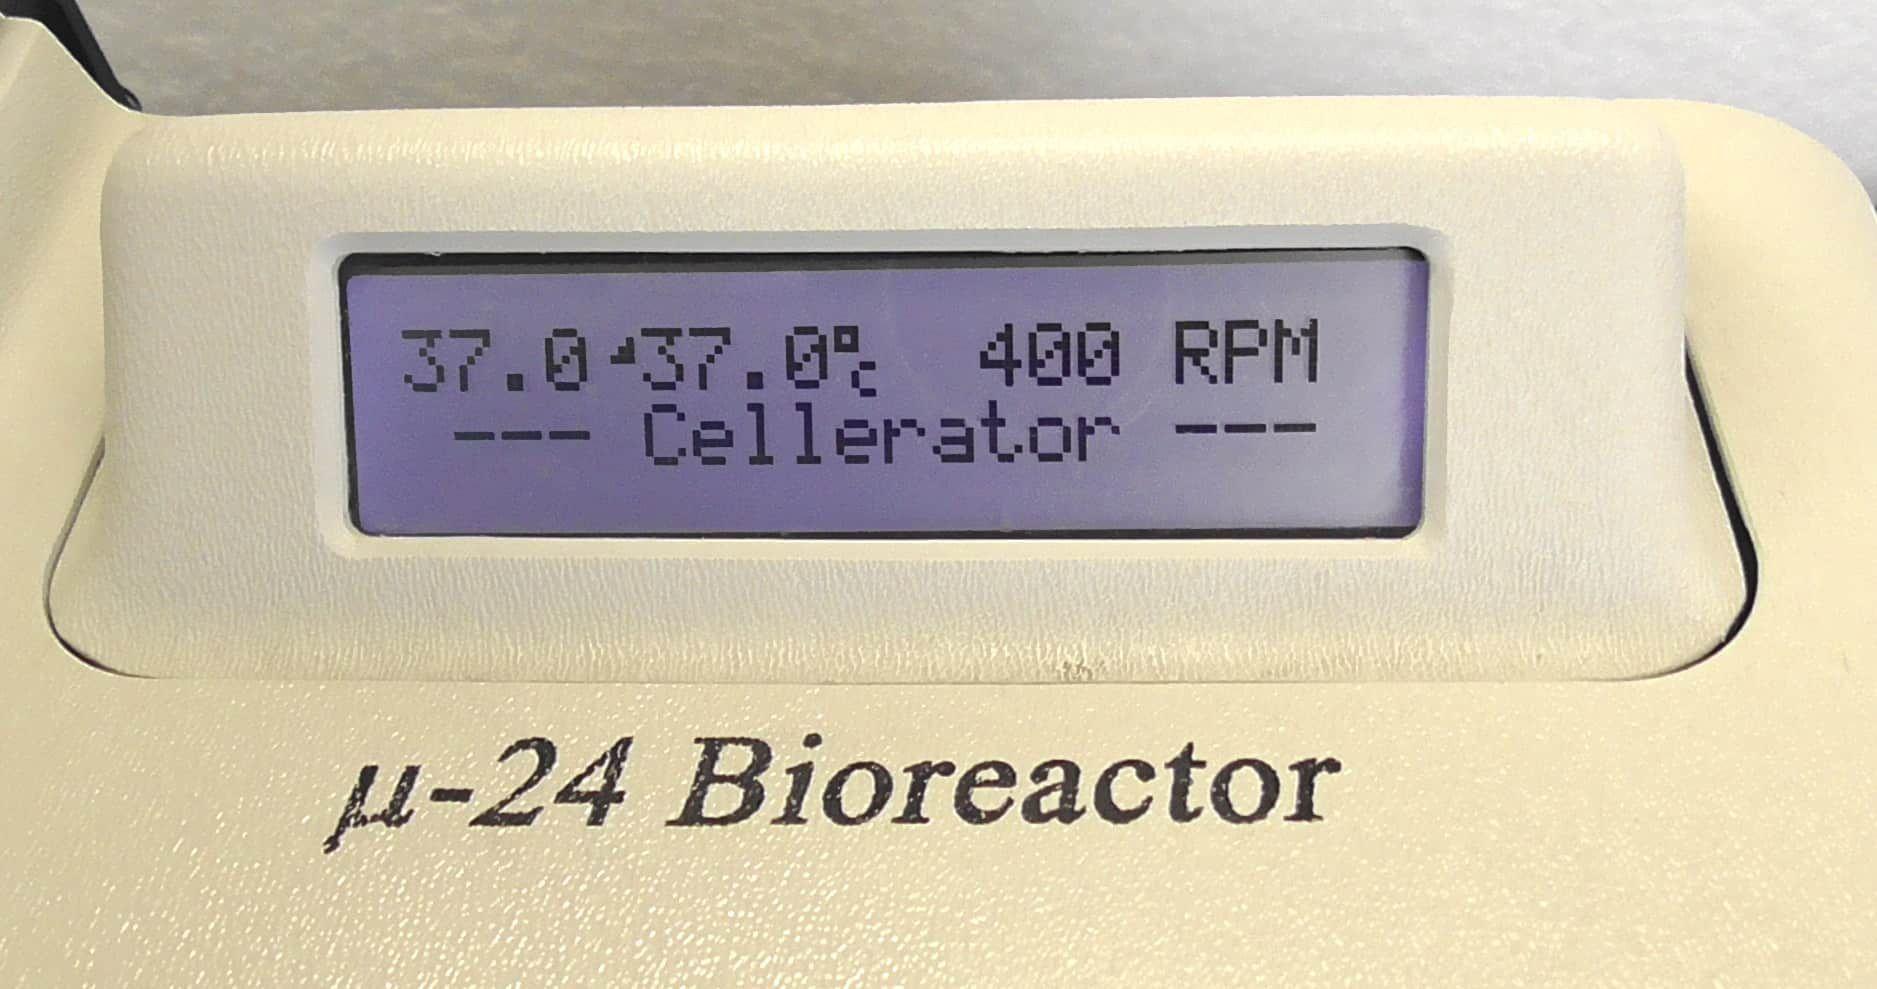 Applikon Biotechnology Pall Micro 24 Bioreactor